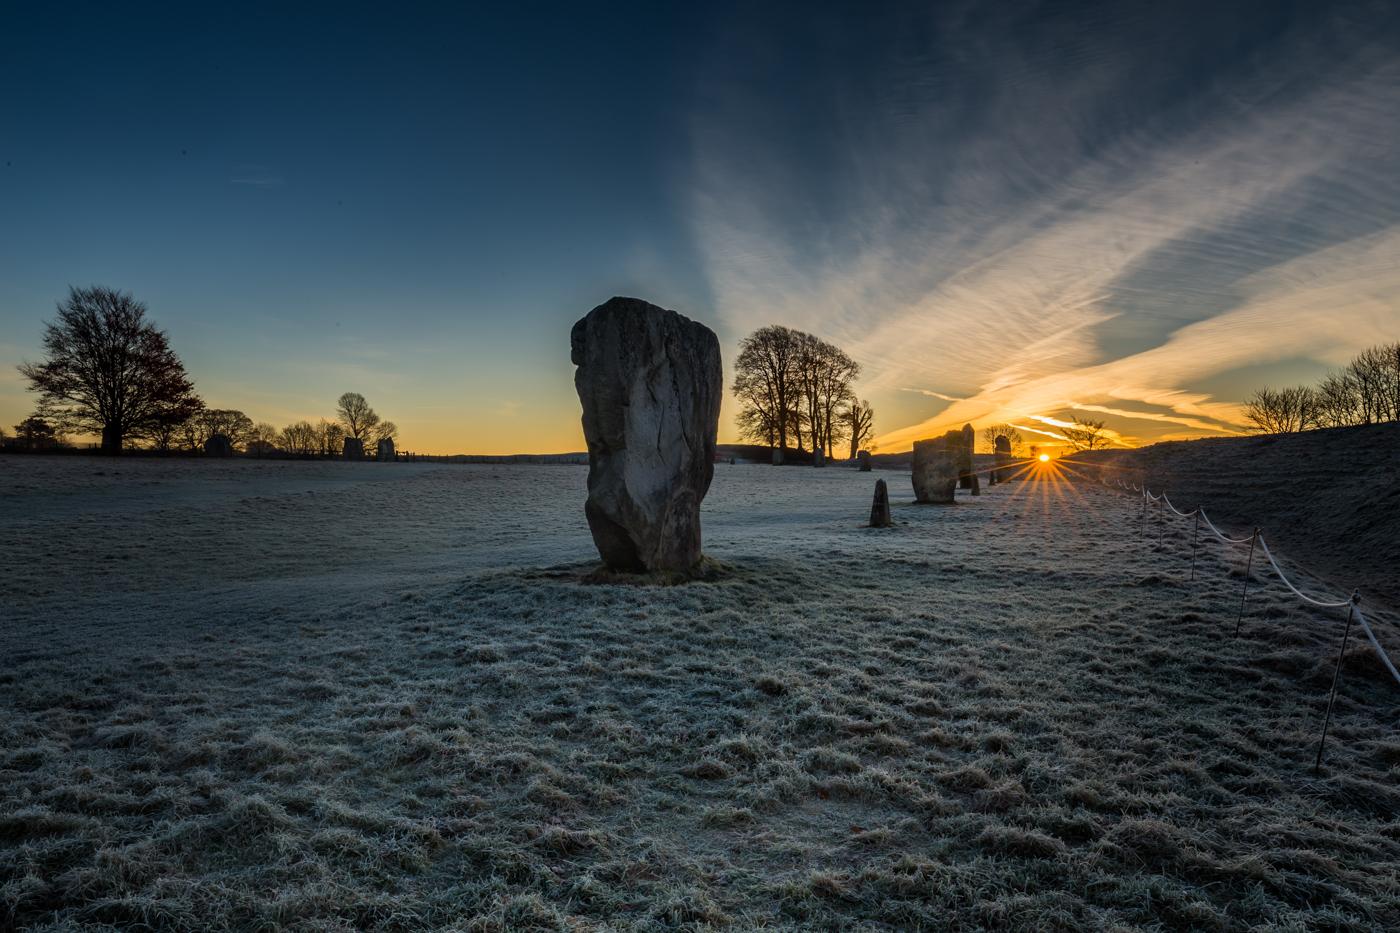 First 'Avebury Stones at Dawn' by John Barton